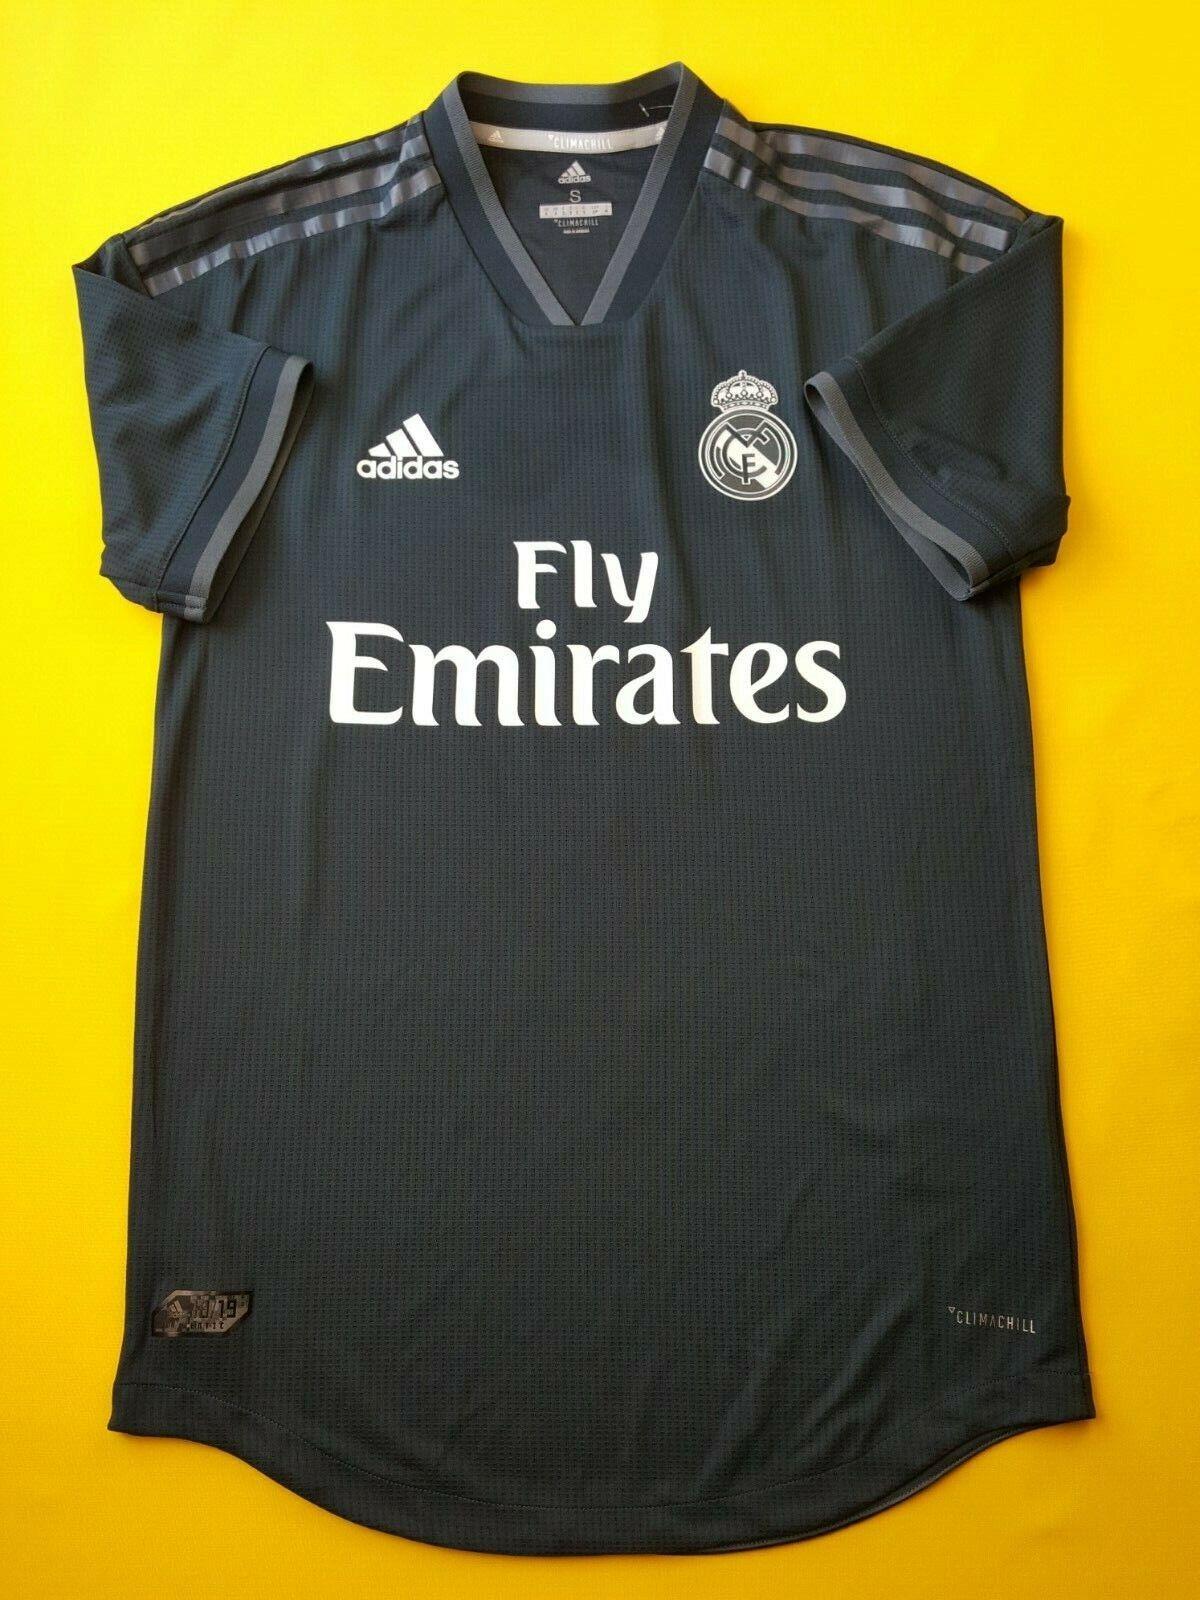 5+ 5 Ronaldo Real Real Real Madrid autentic jersey medium 2018 shirt CY6329 Adidas ig93 9114a3